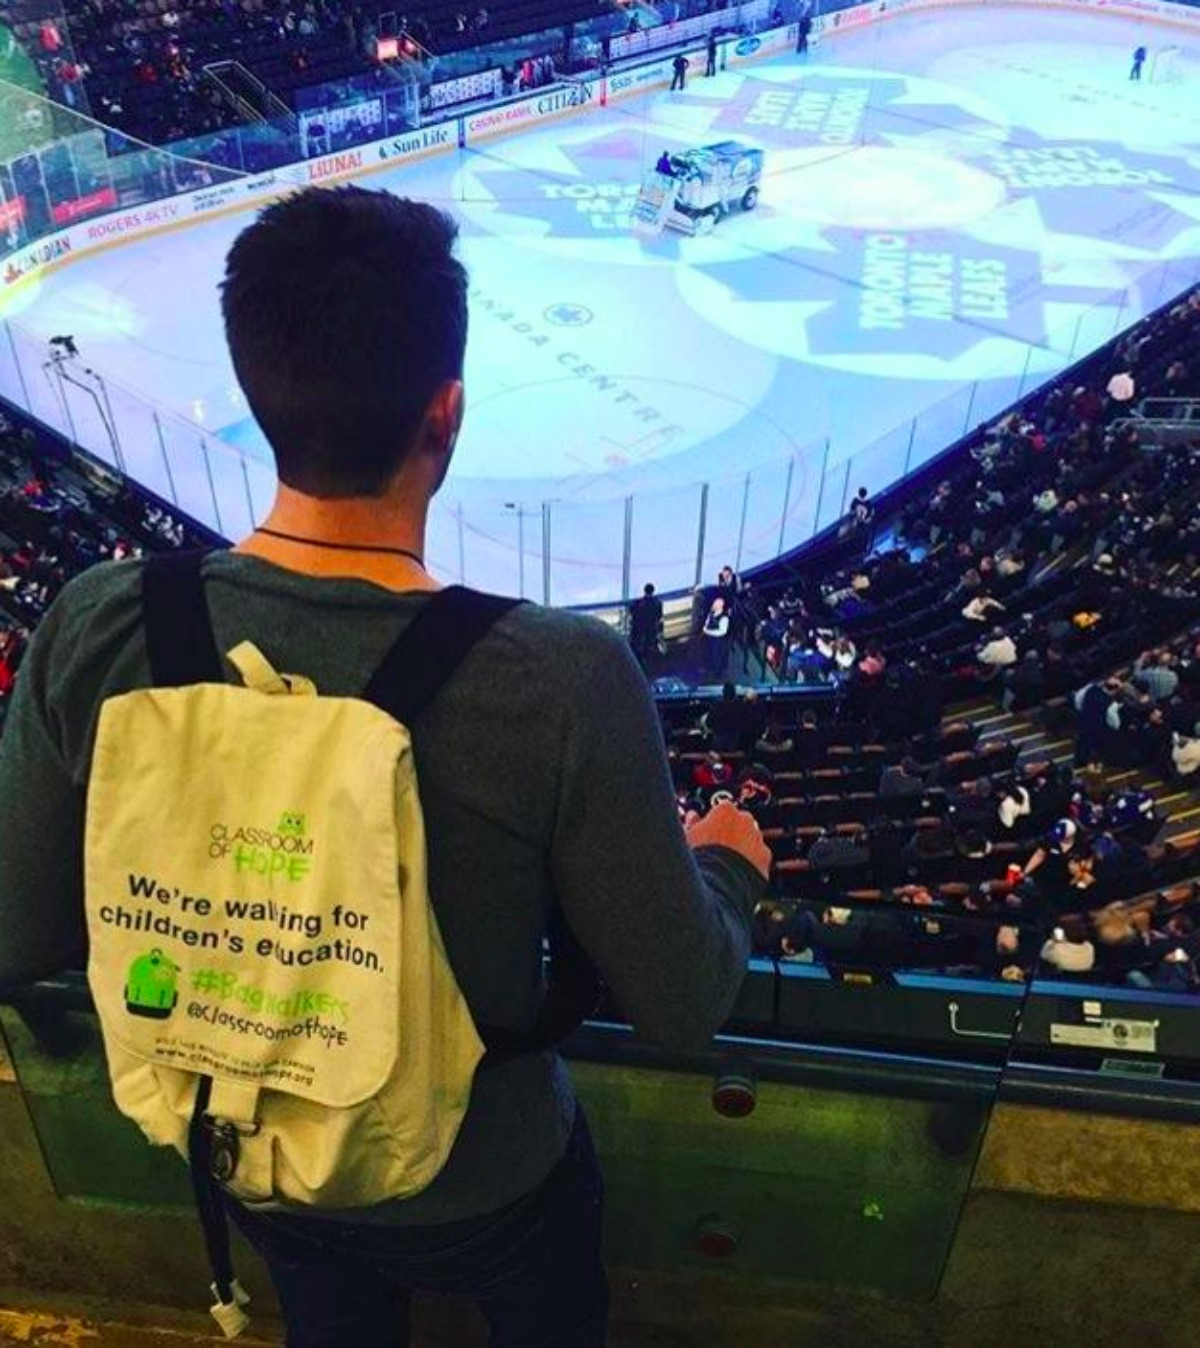 Ice hockey rink BagWalkers Double-Barrelled Travel